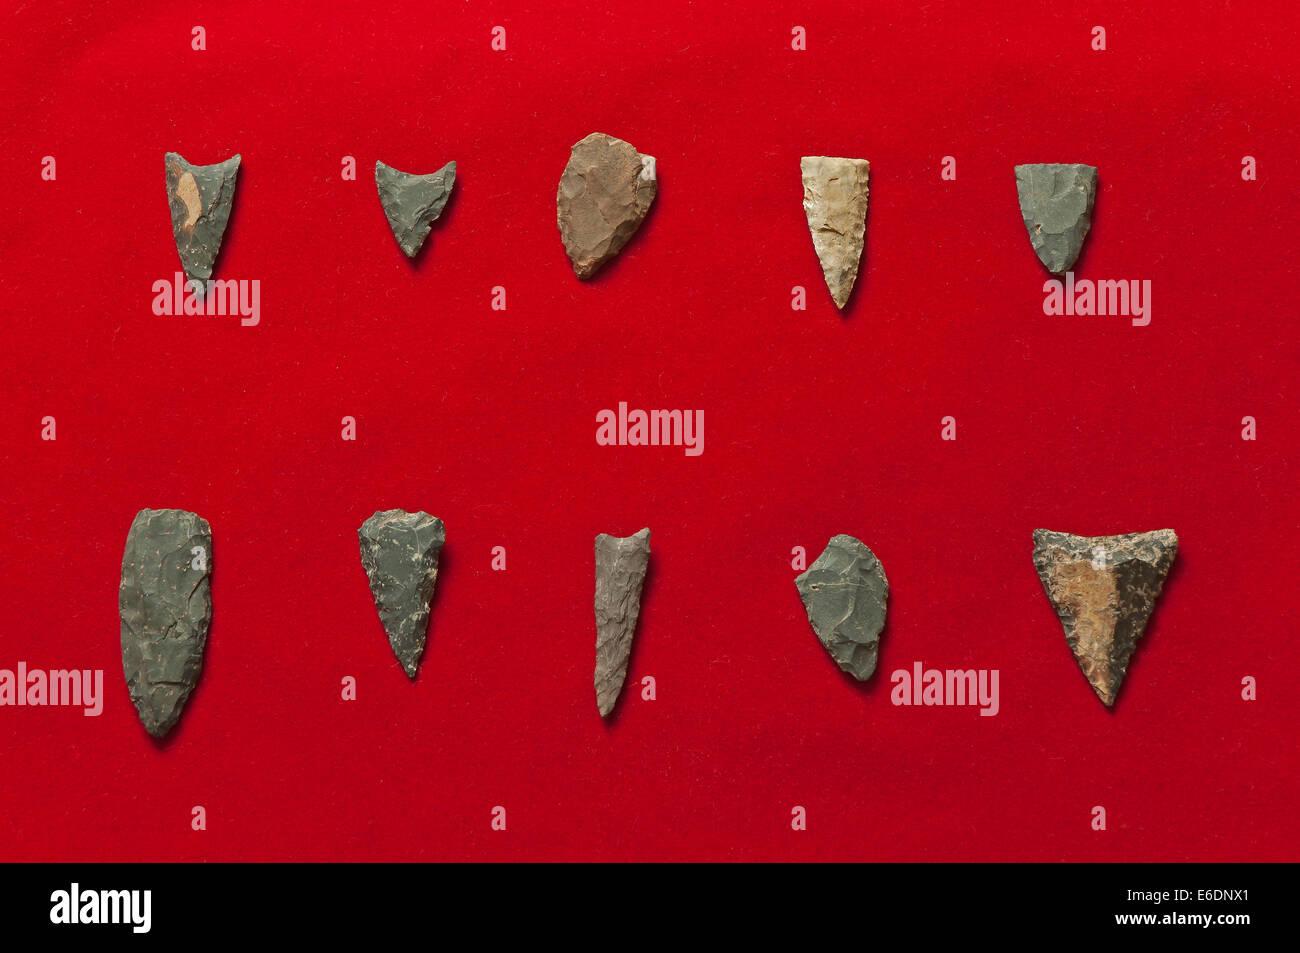 Neolithic arrowheads - 2500 BC, archaeological site of Cabezo Jure, Alosno, Huelva province, Region of Andalusia, - Stock Image